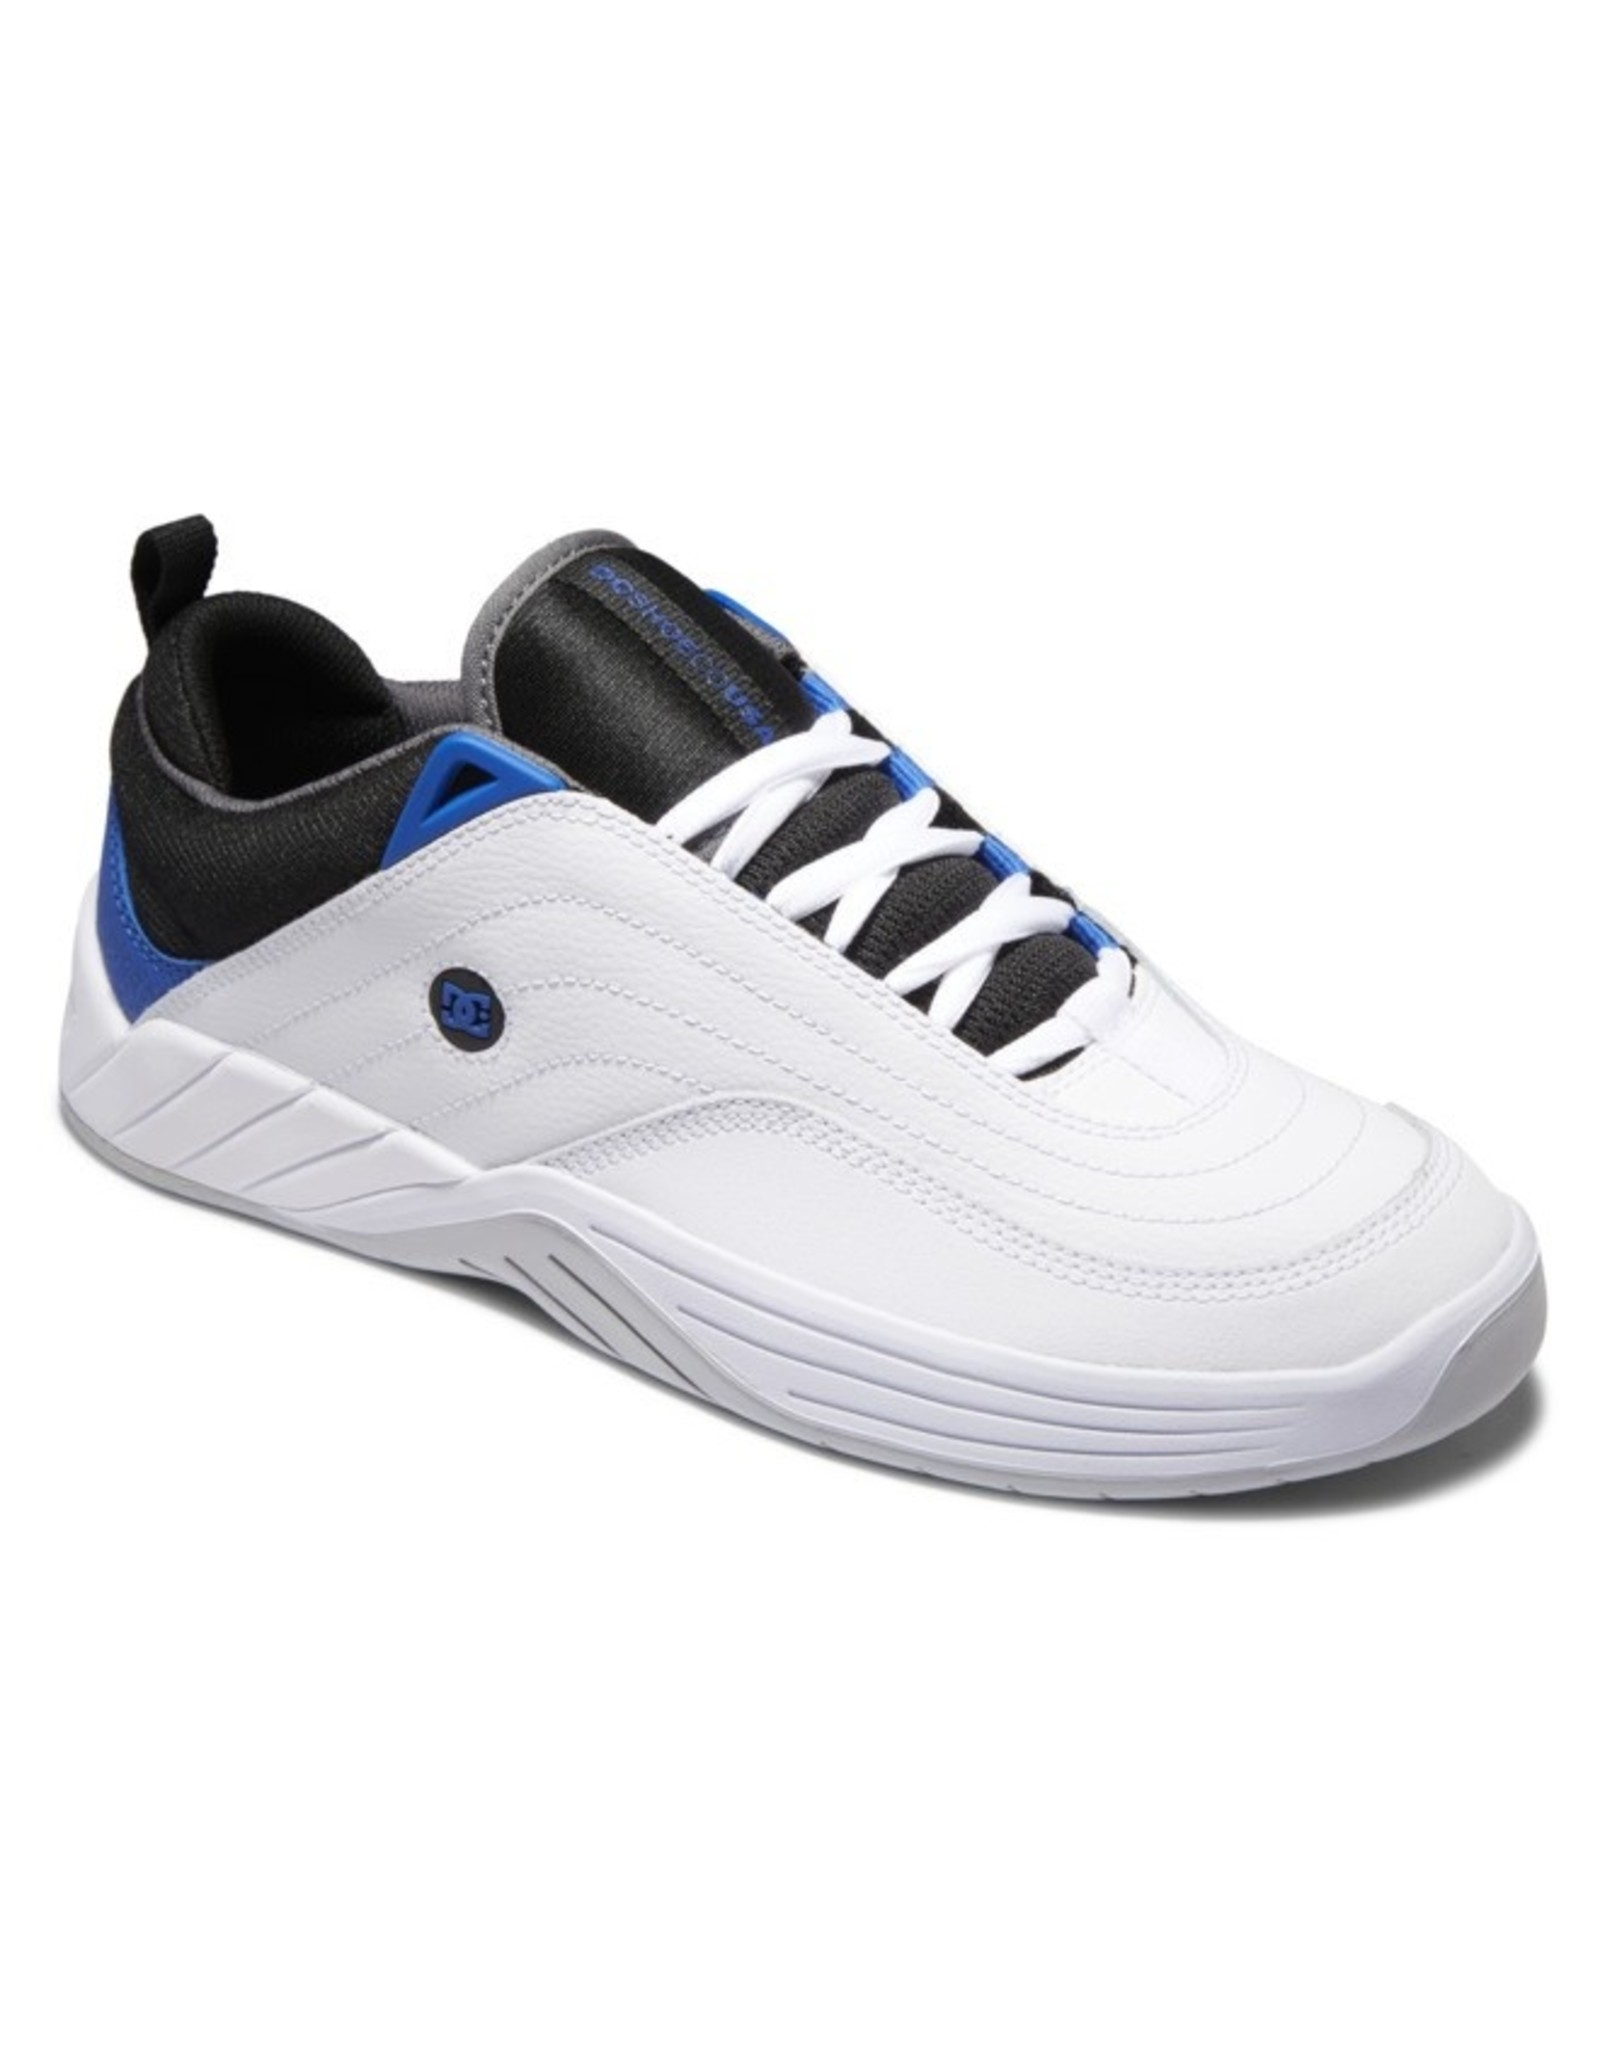 DC SHOES CO. DC - WILLIAMS SLIM - WHITE/BLACK/BLUE